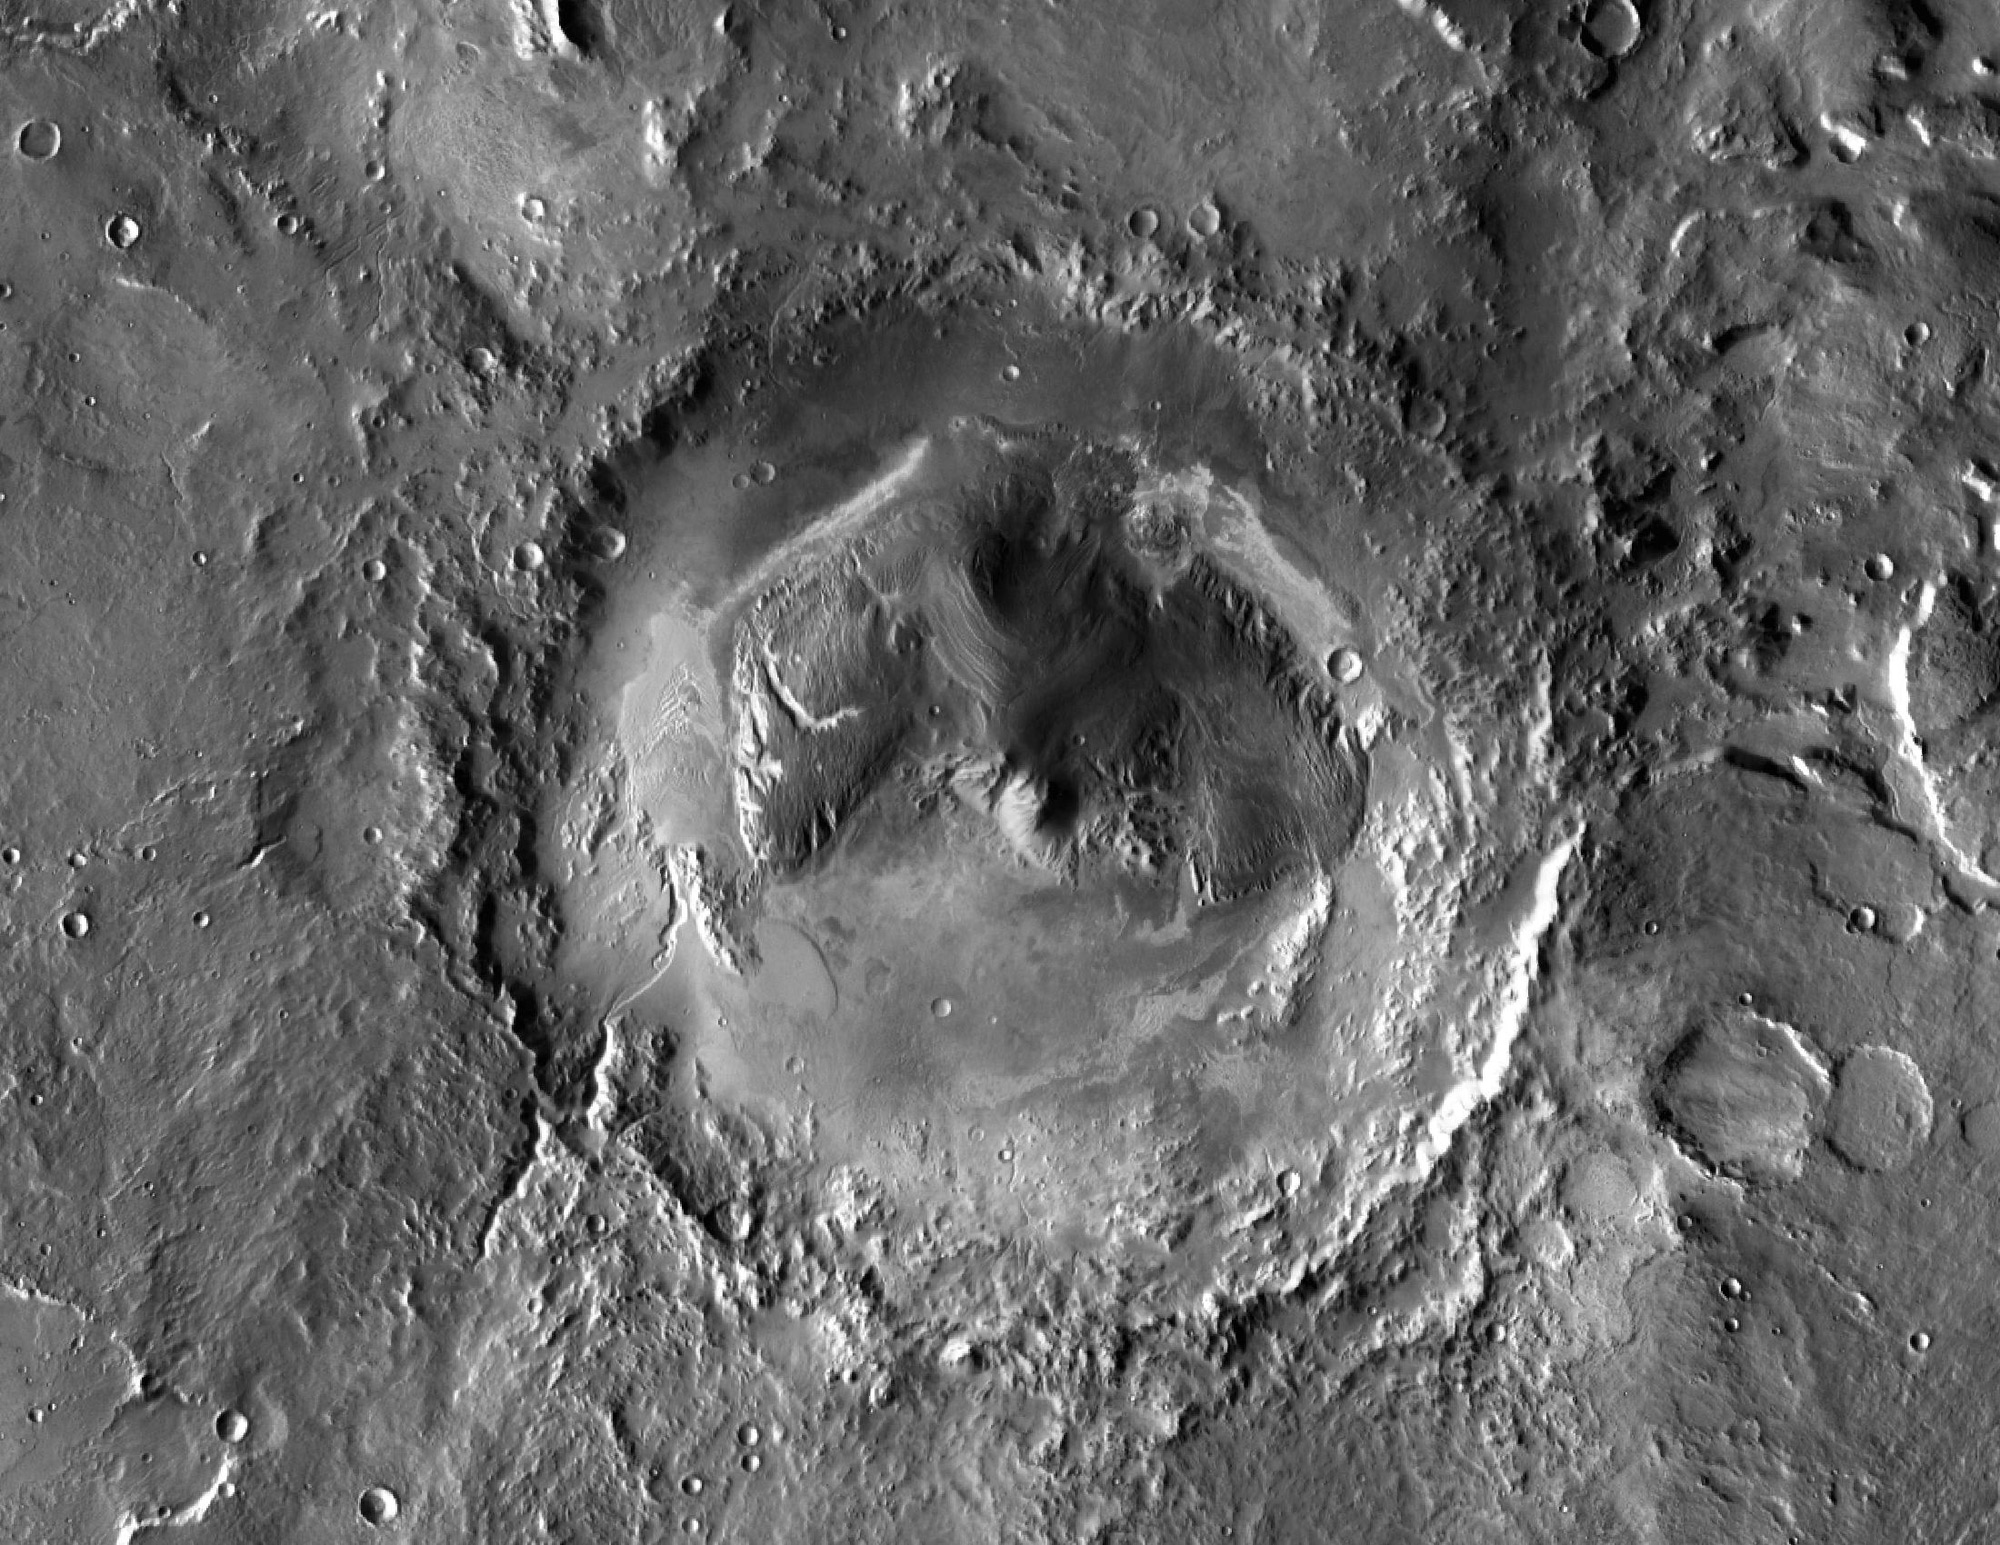 gale crater photos ile ilgili görsel sonucu